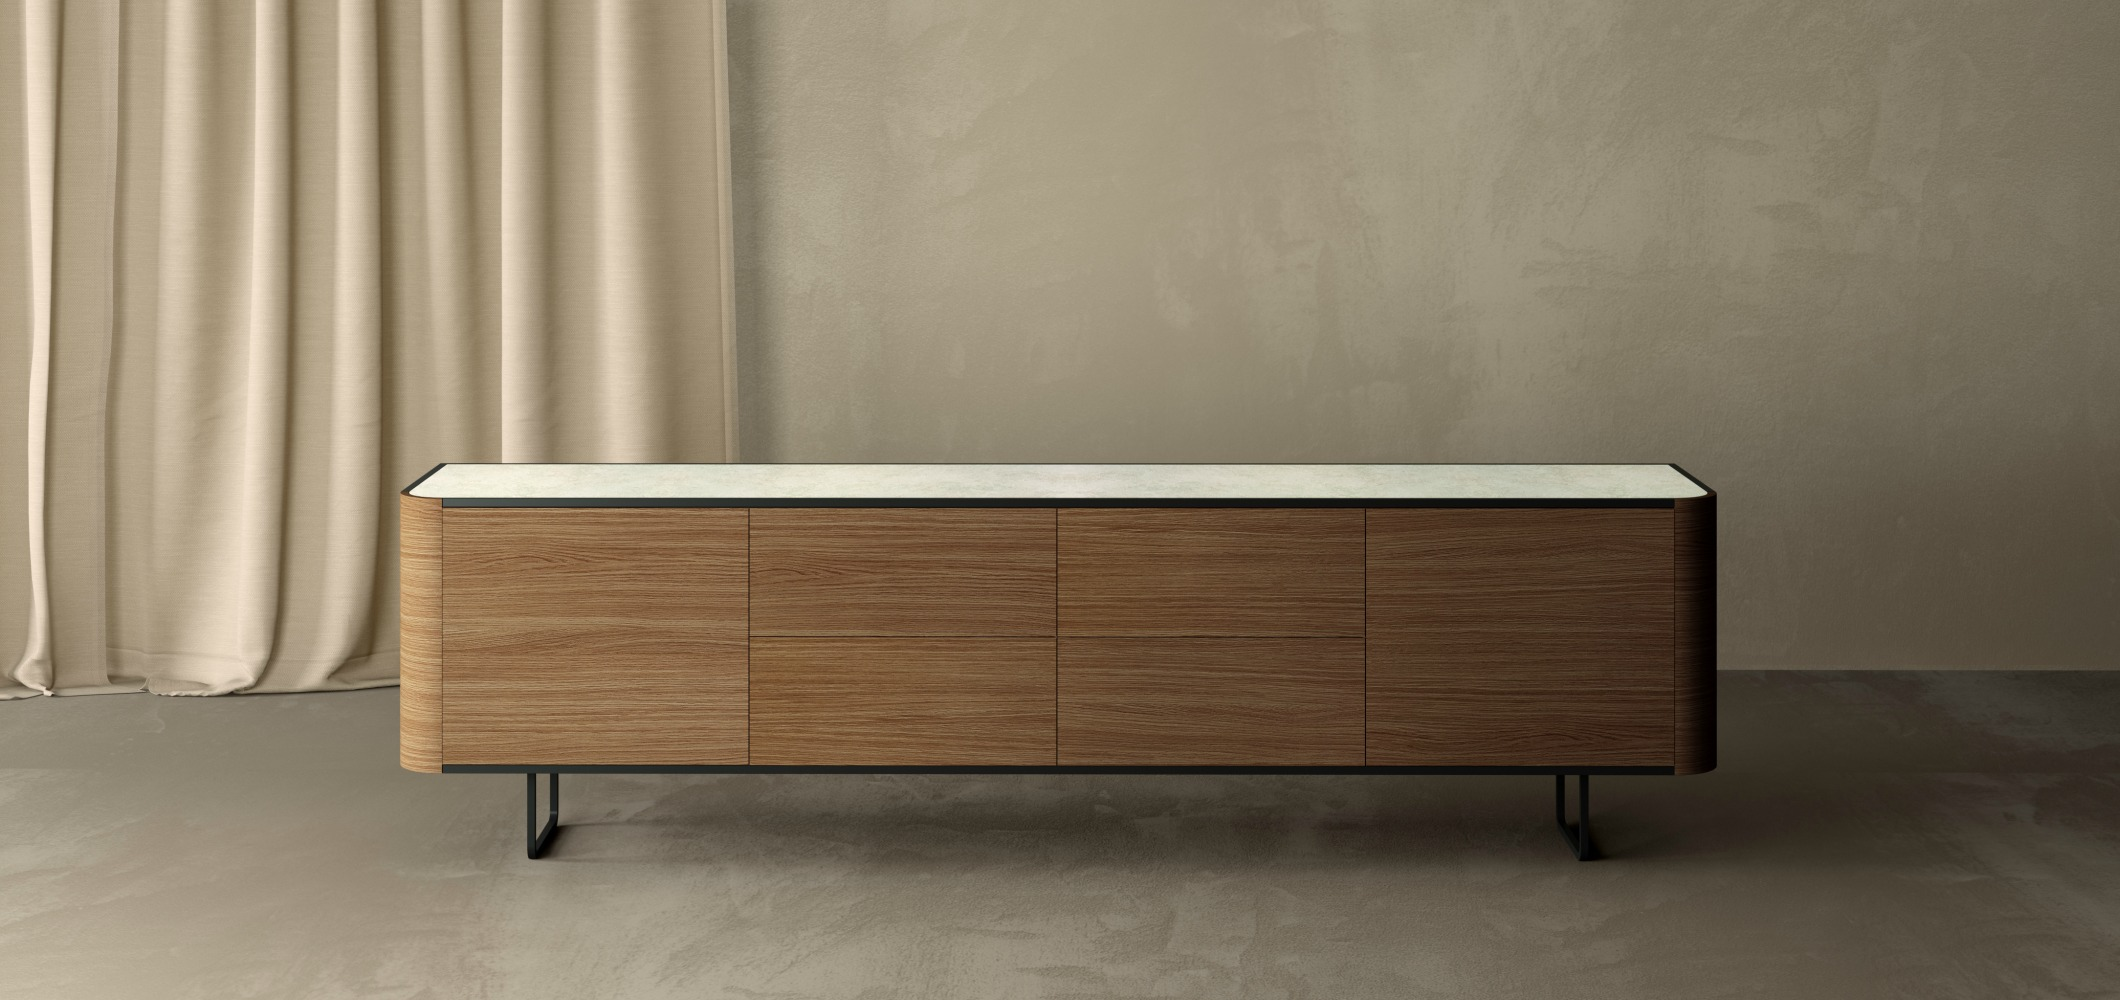 Adara Momoccca, muebles diseño